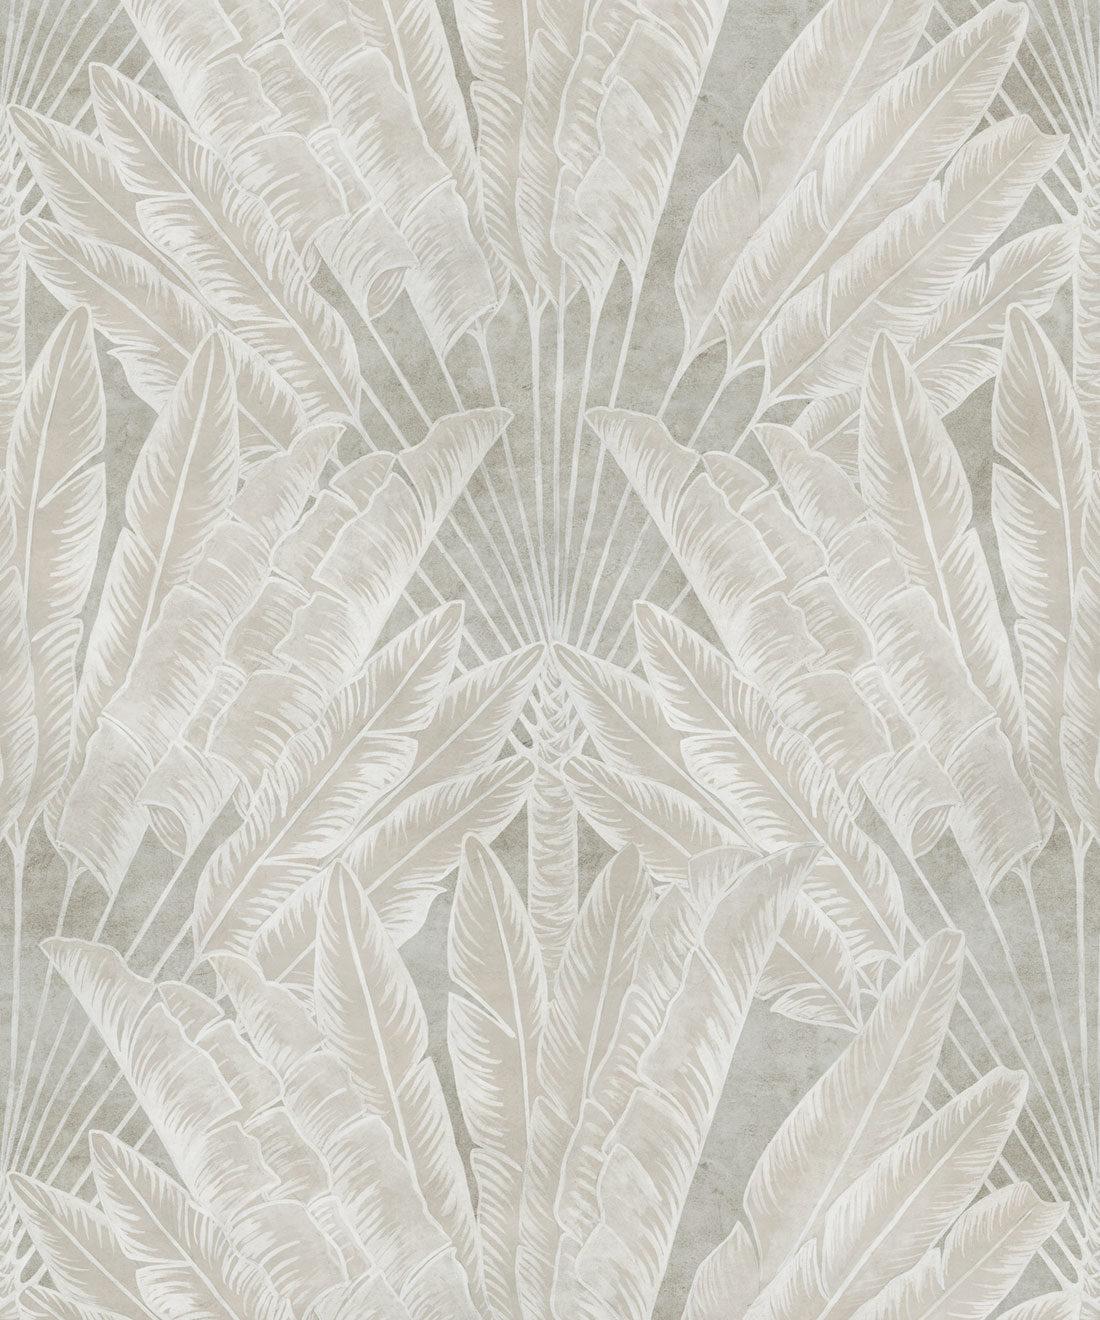 Travelers Palm Wallpaper